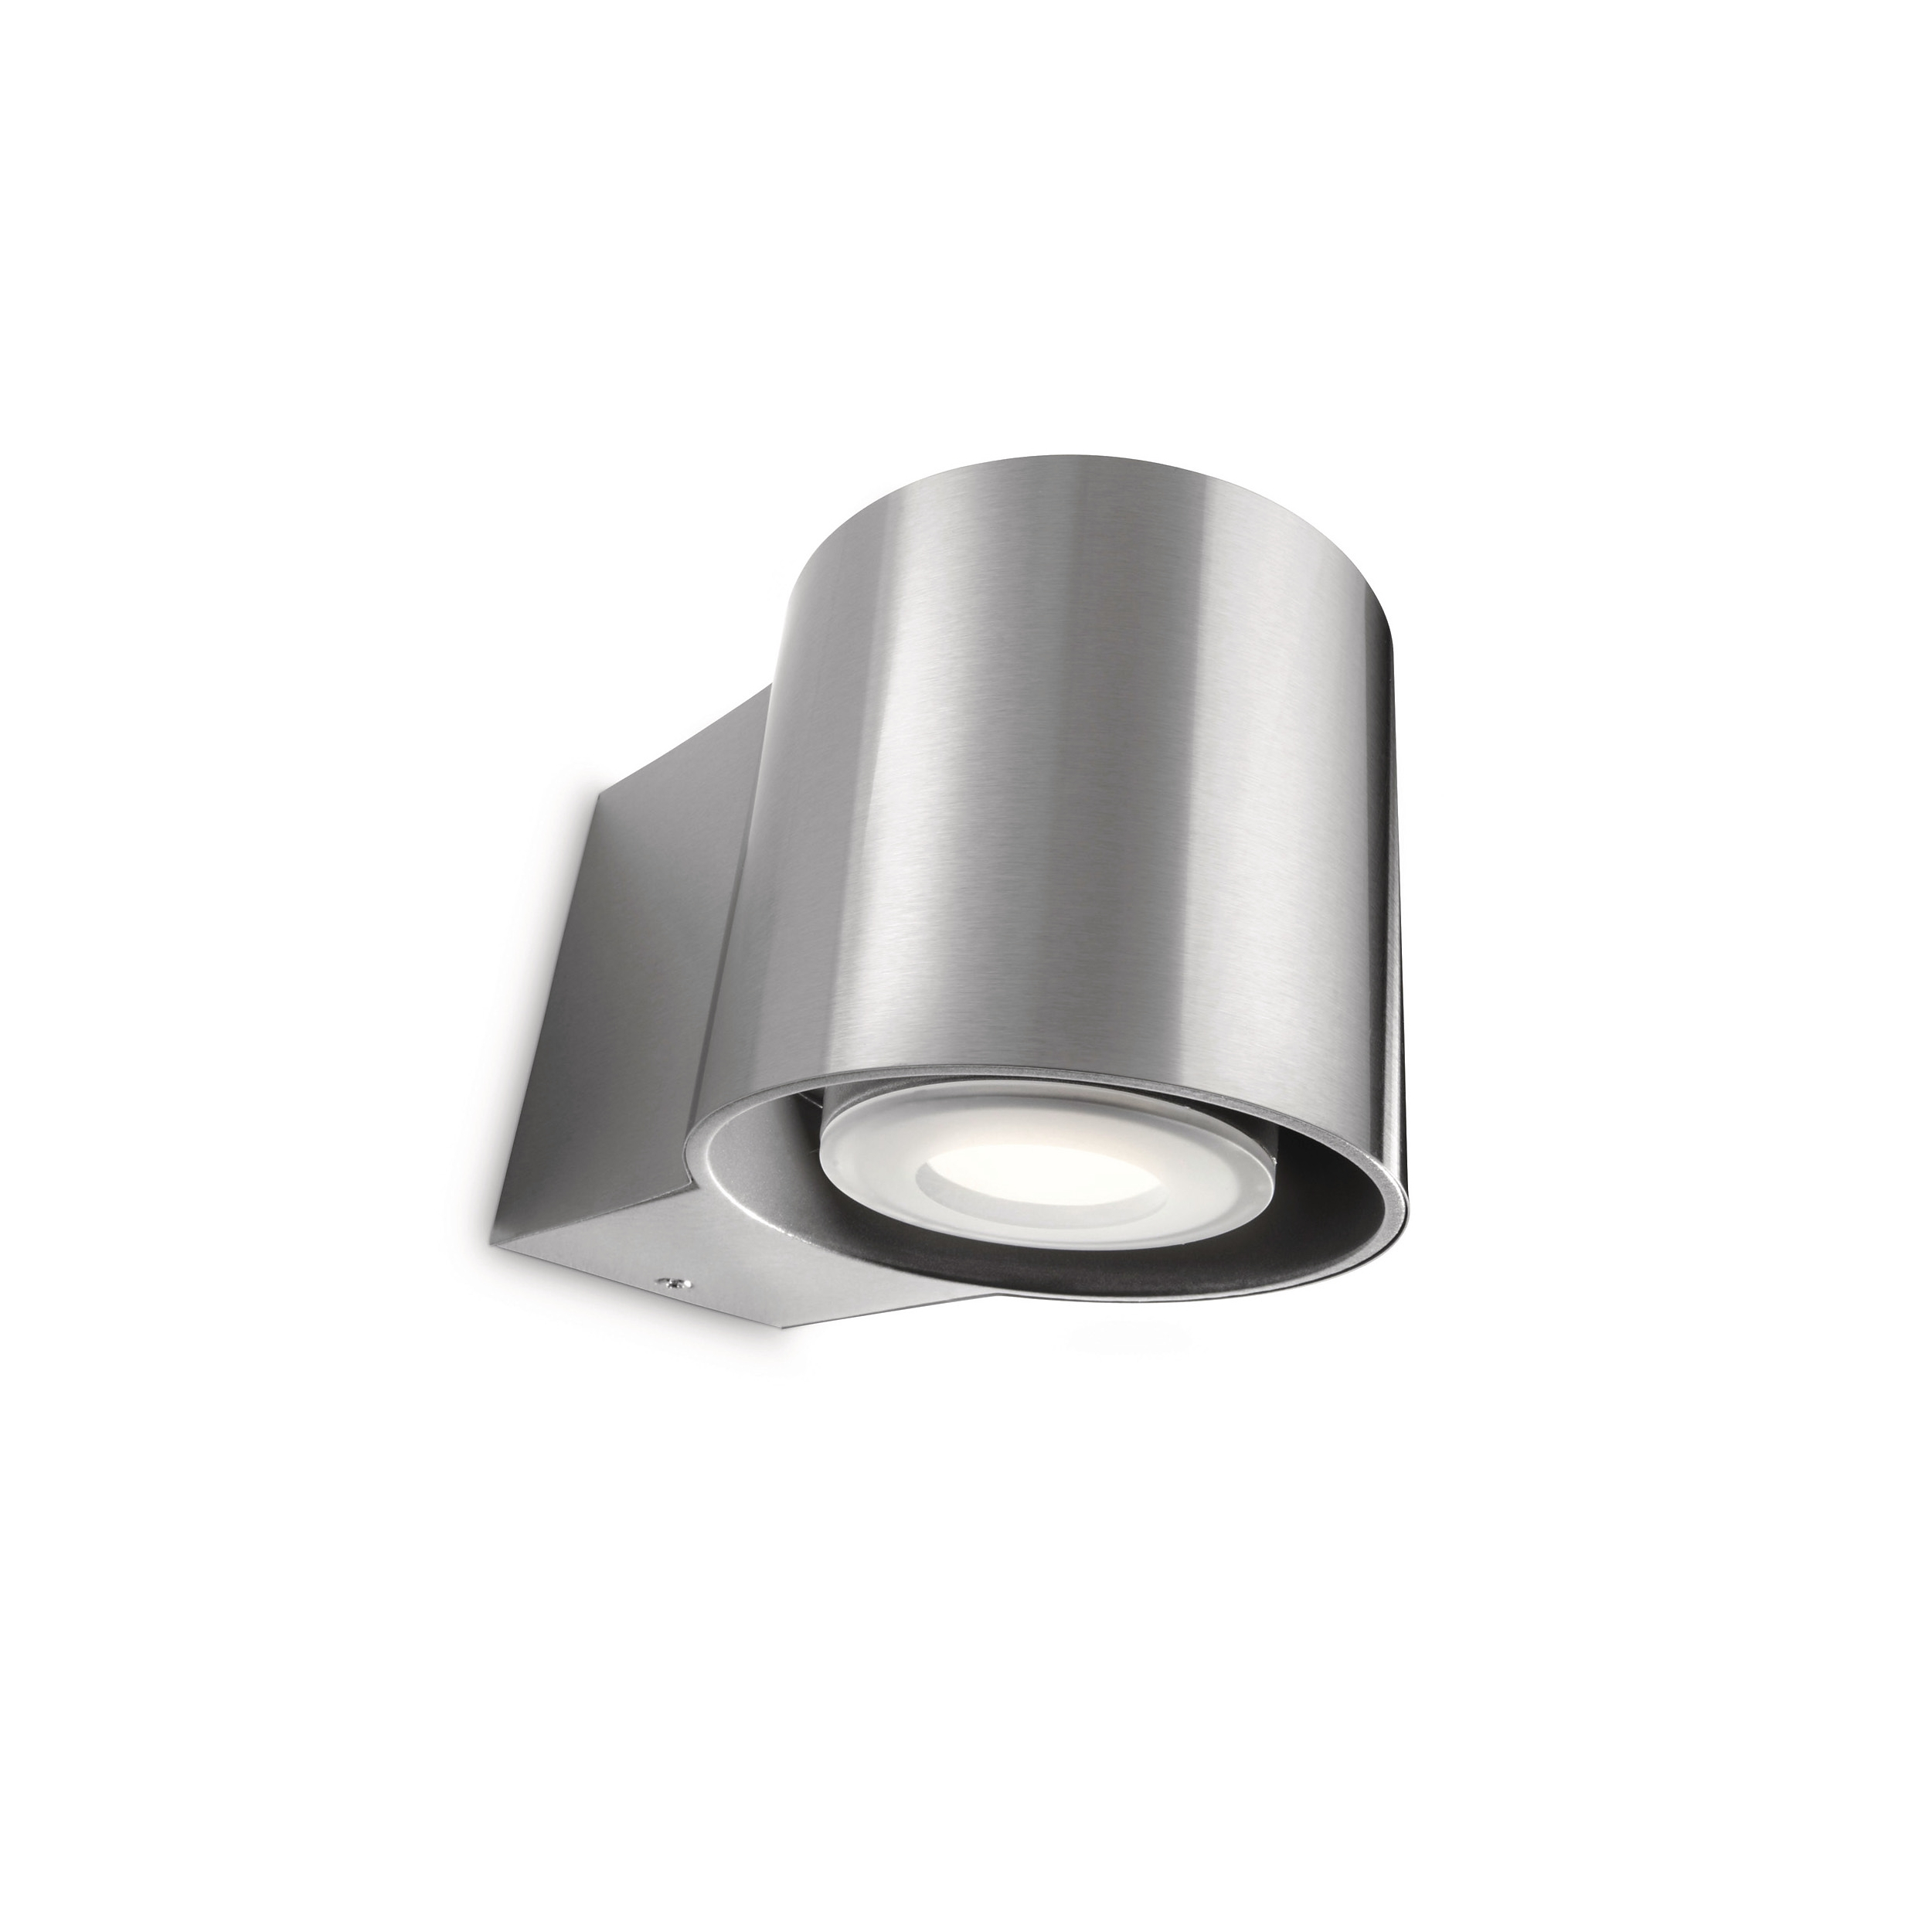 philips ledino applique murale ext rieur moderne lampe. Black Bedroom Furniture Sets. Home Design Ideas